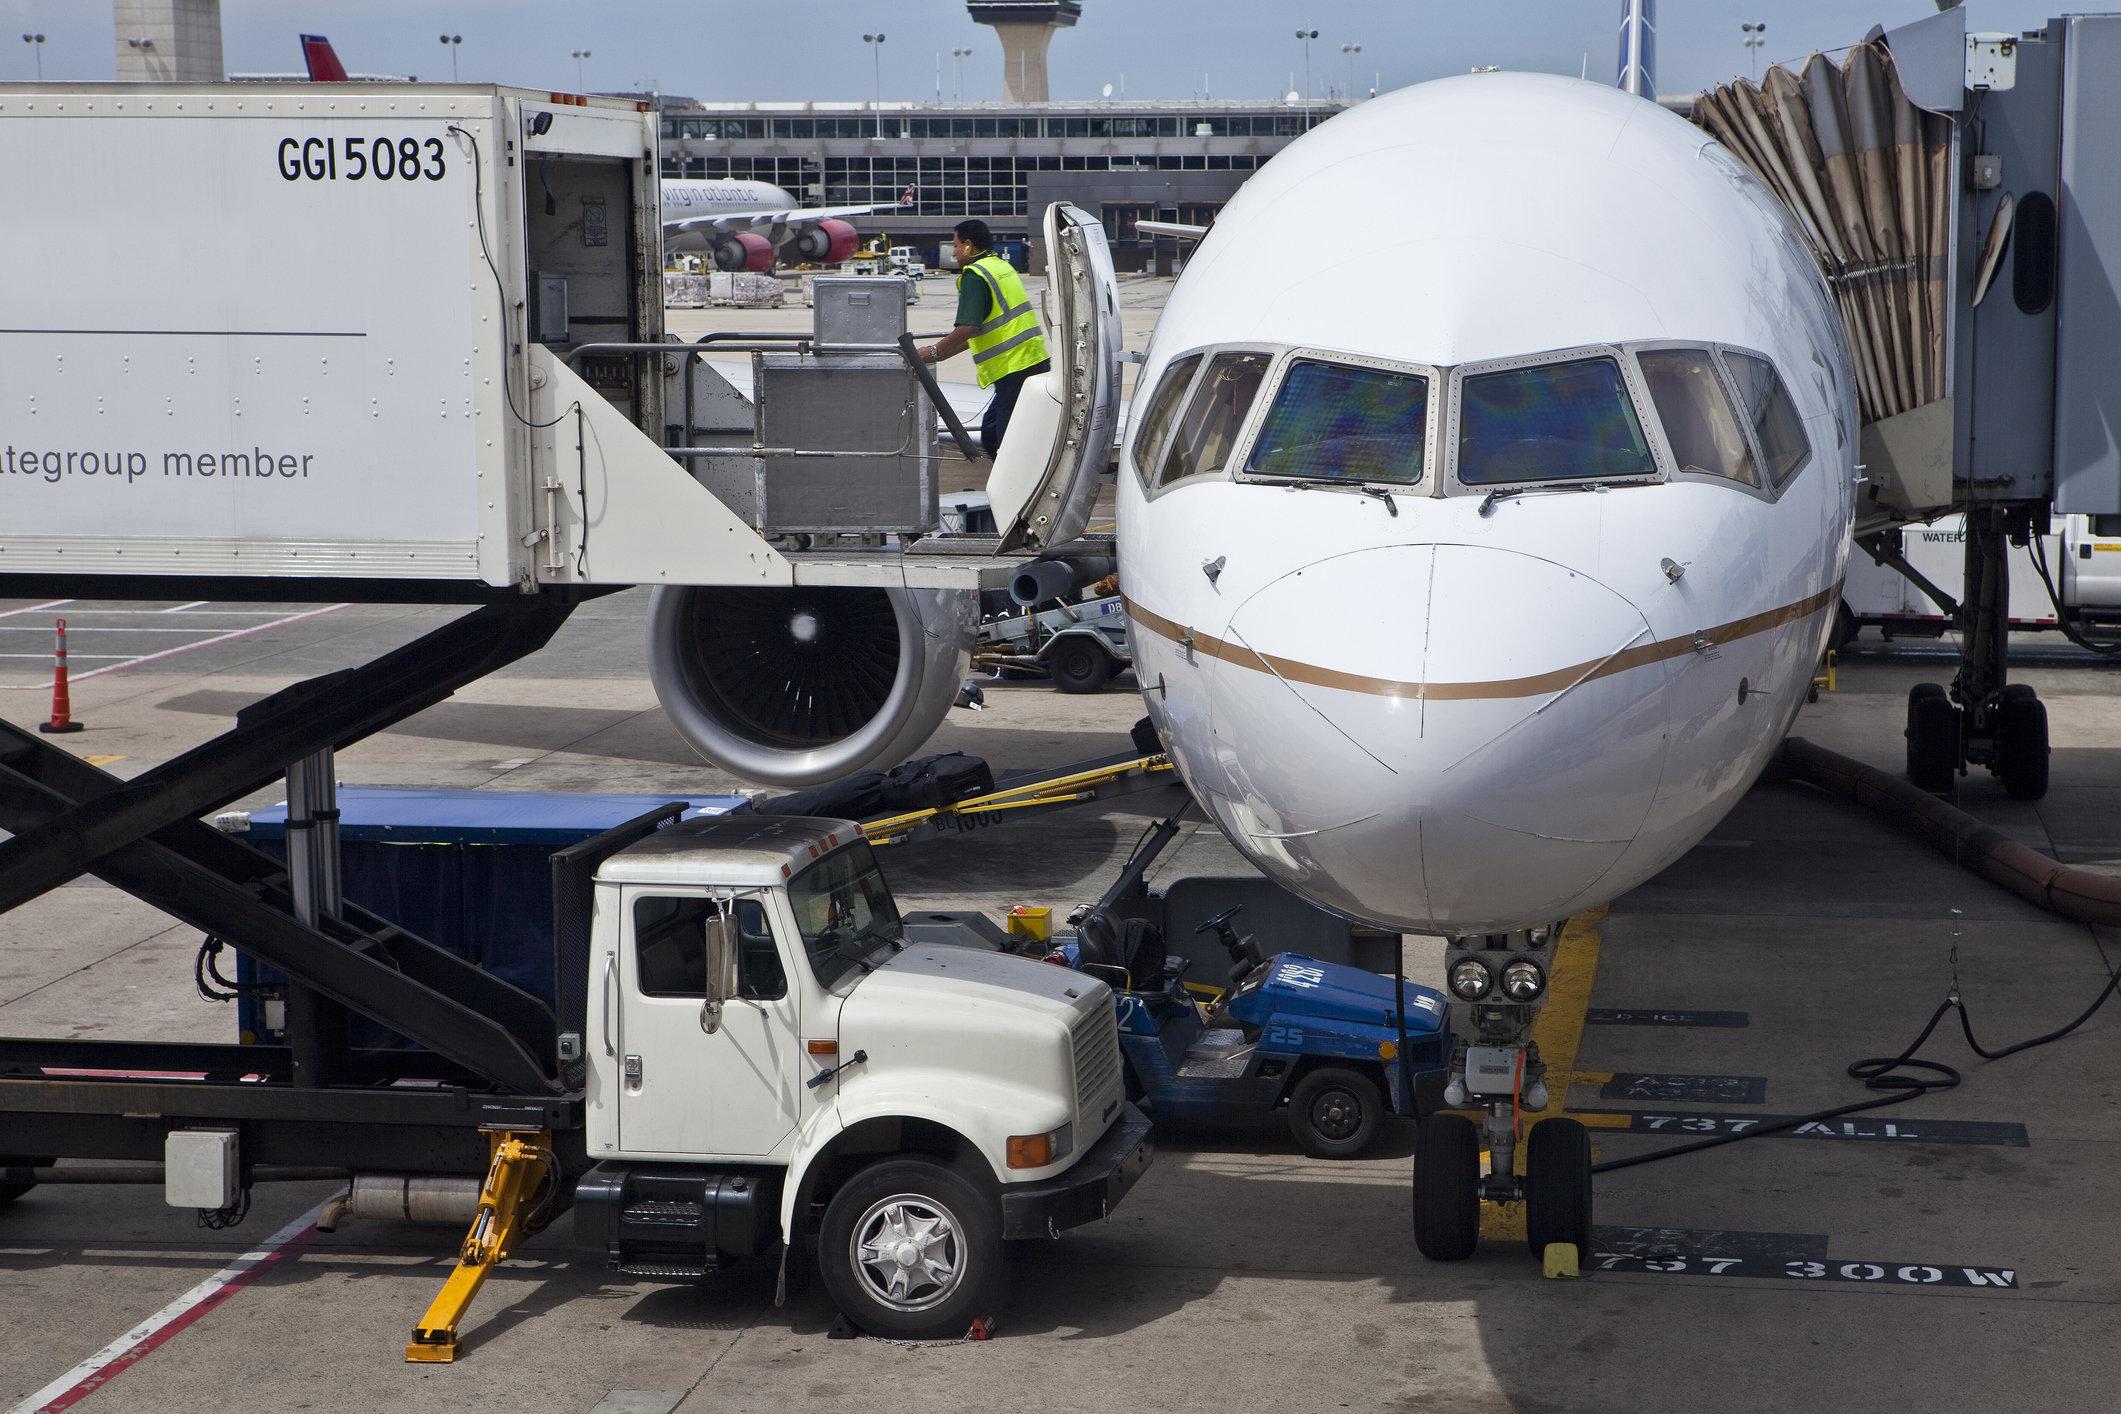 Baggage Handler Gets Locked Inside Planes Cargo Area